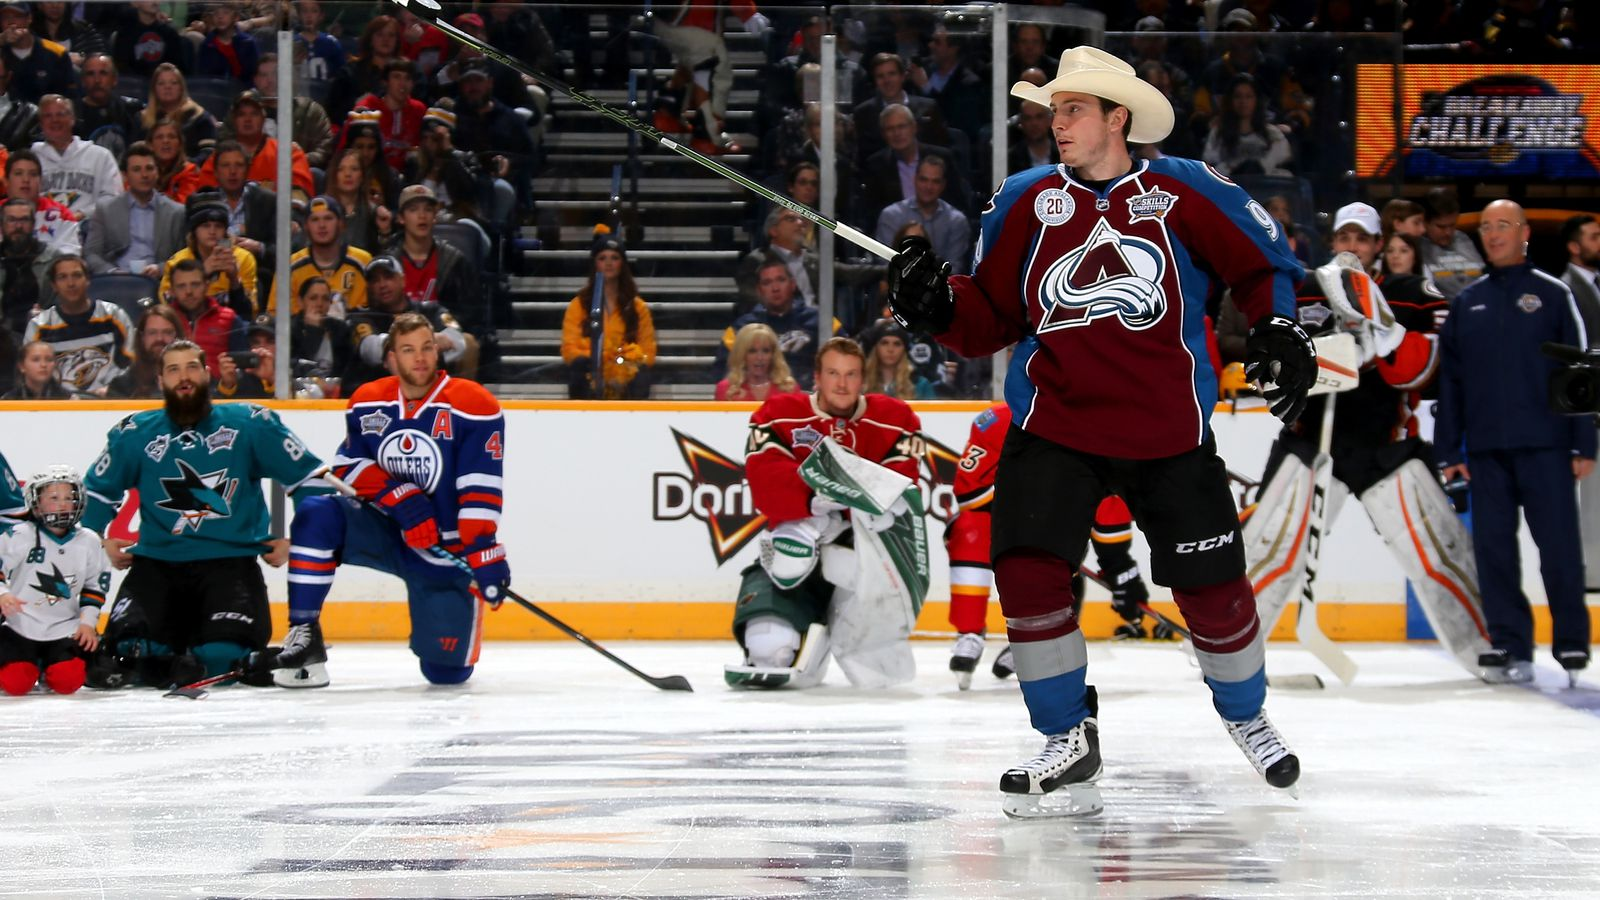 NHL to scrap All-Star 'Breakaway Challenge' starting this year, per report